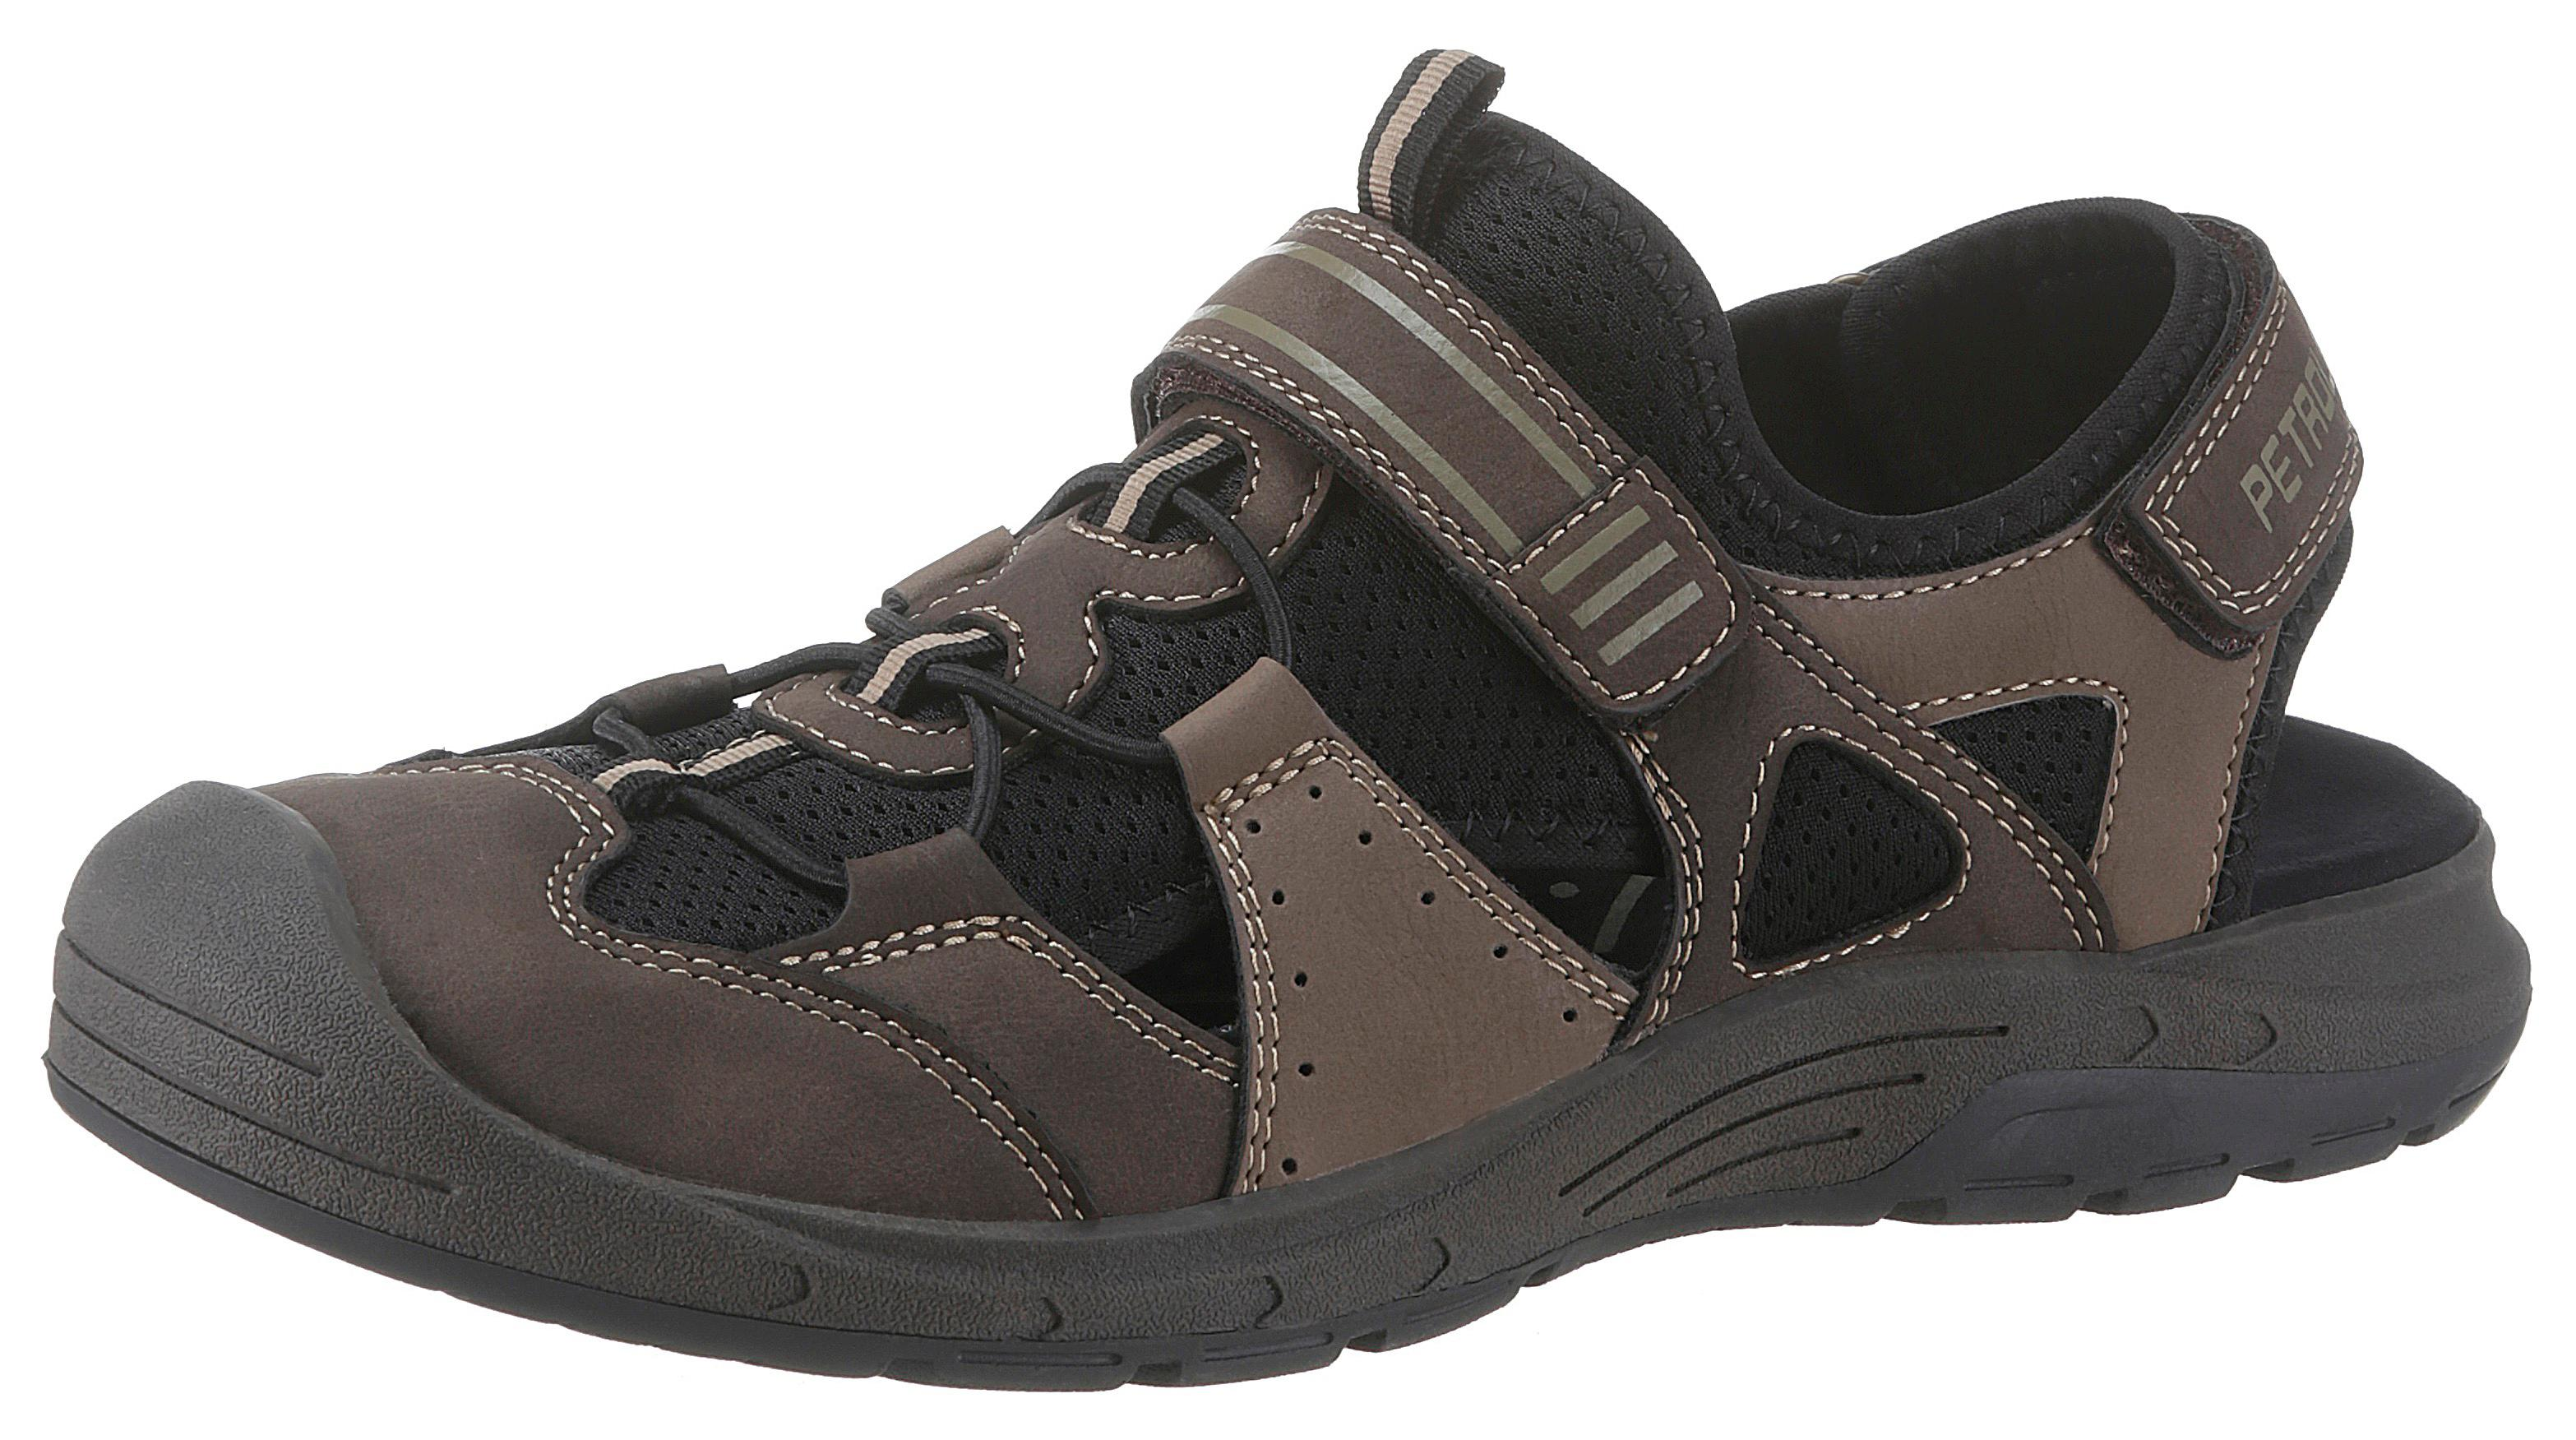 PETROLIO Sandale | Schuhe > Sandalen & Zehentrenner > Sandalen | Petrolio